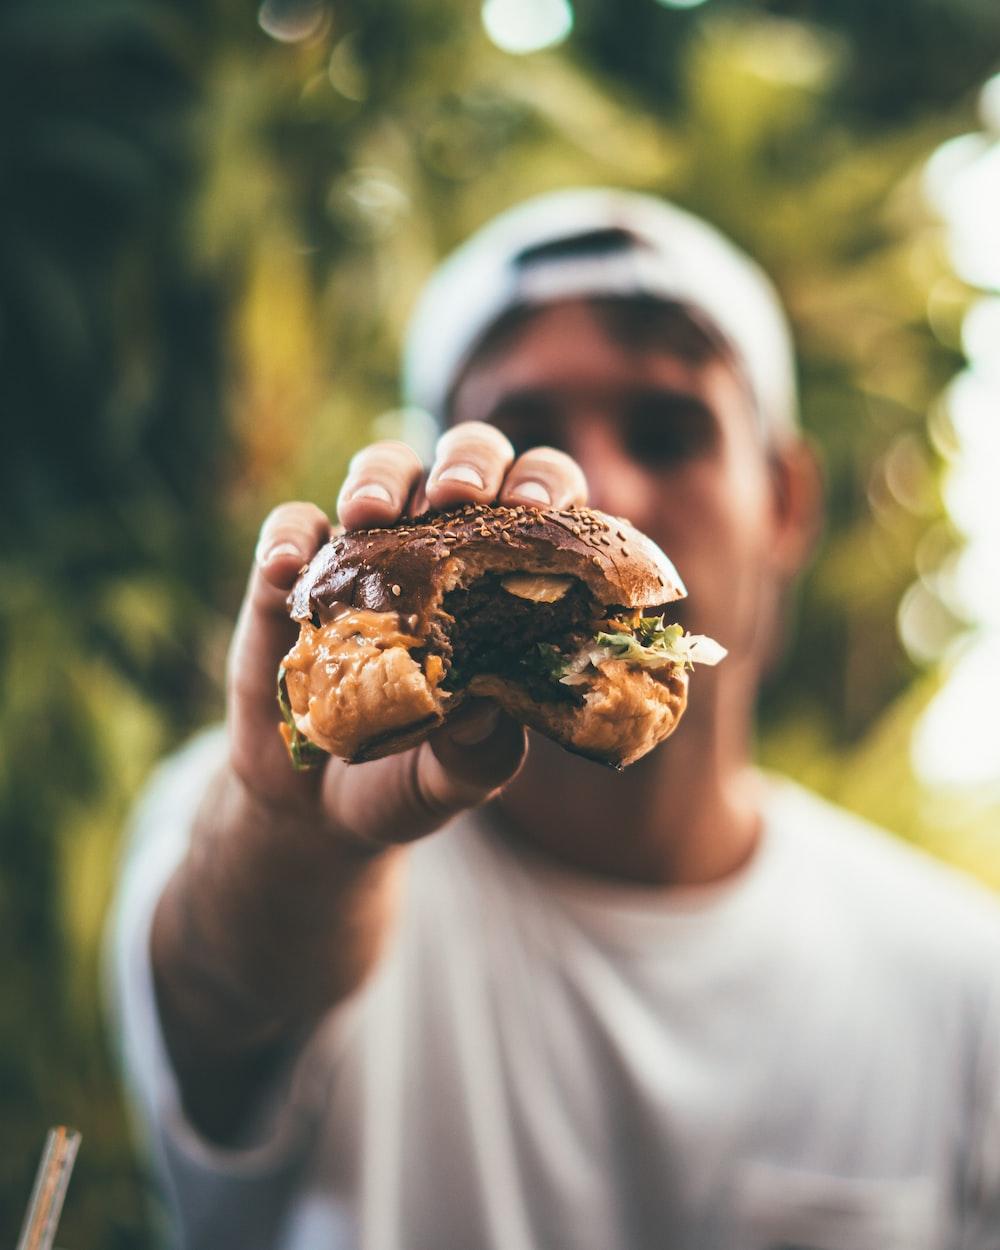 selective focus photography of man holding eaten burger